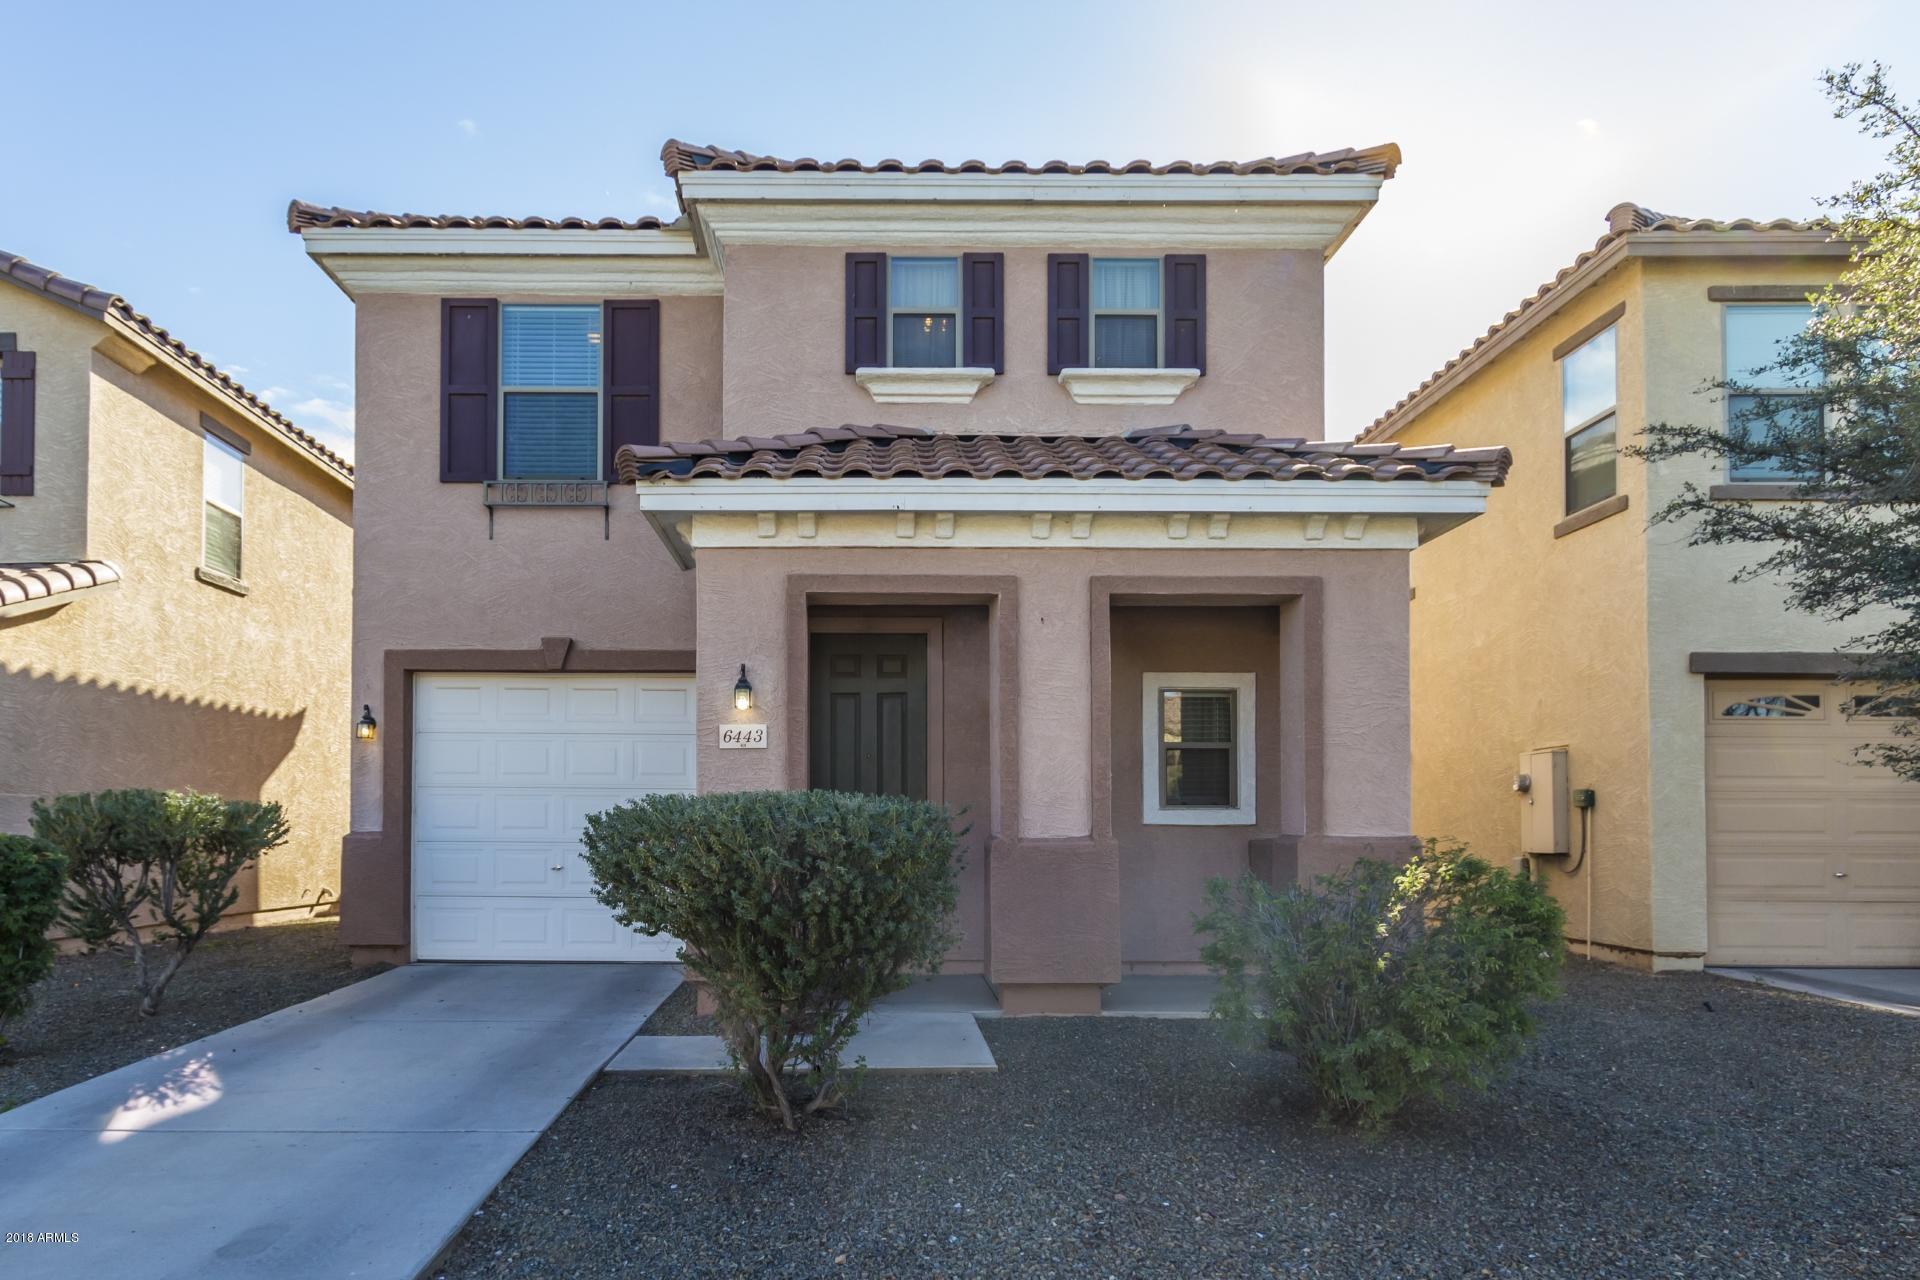 Photo of 6443 W SOPHIE Lane, Laveen, AZ 85339